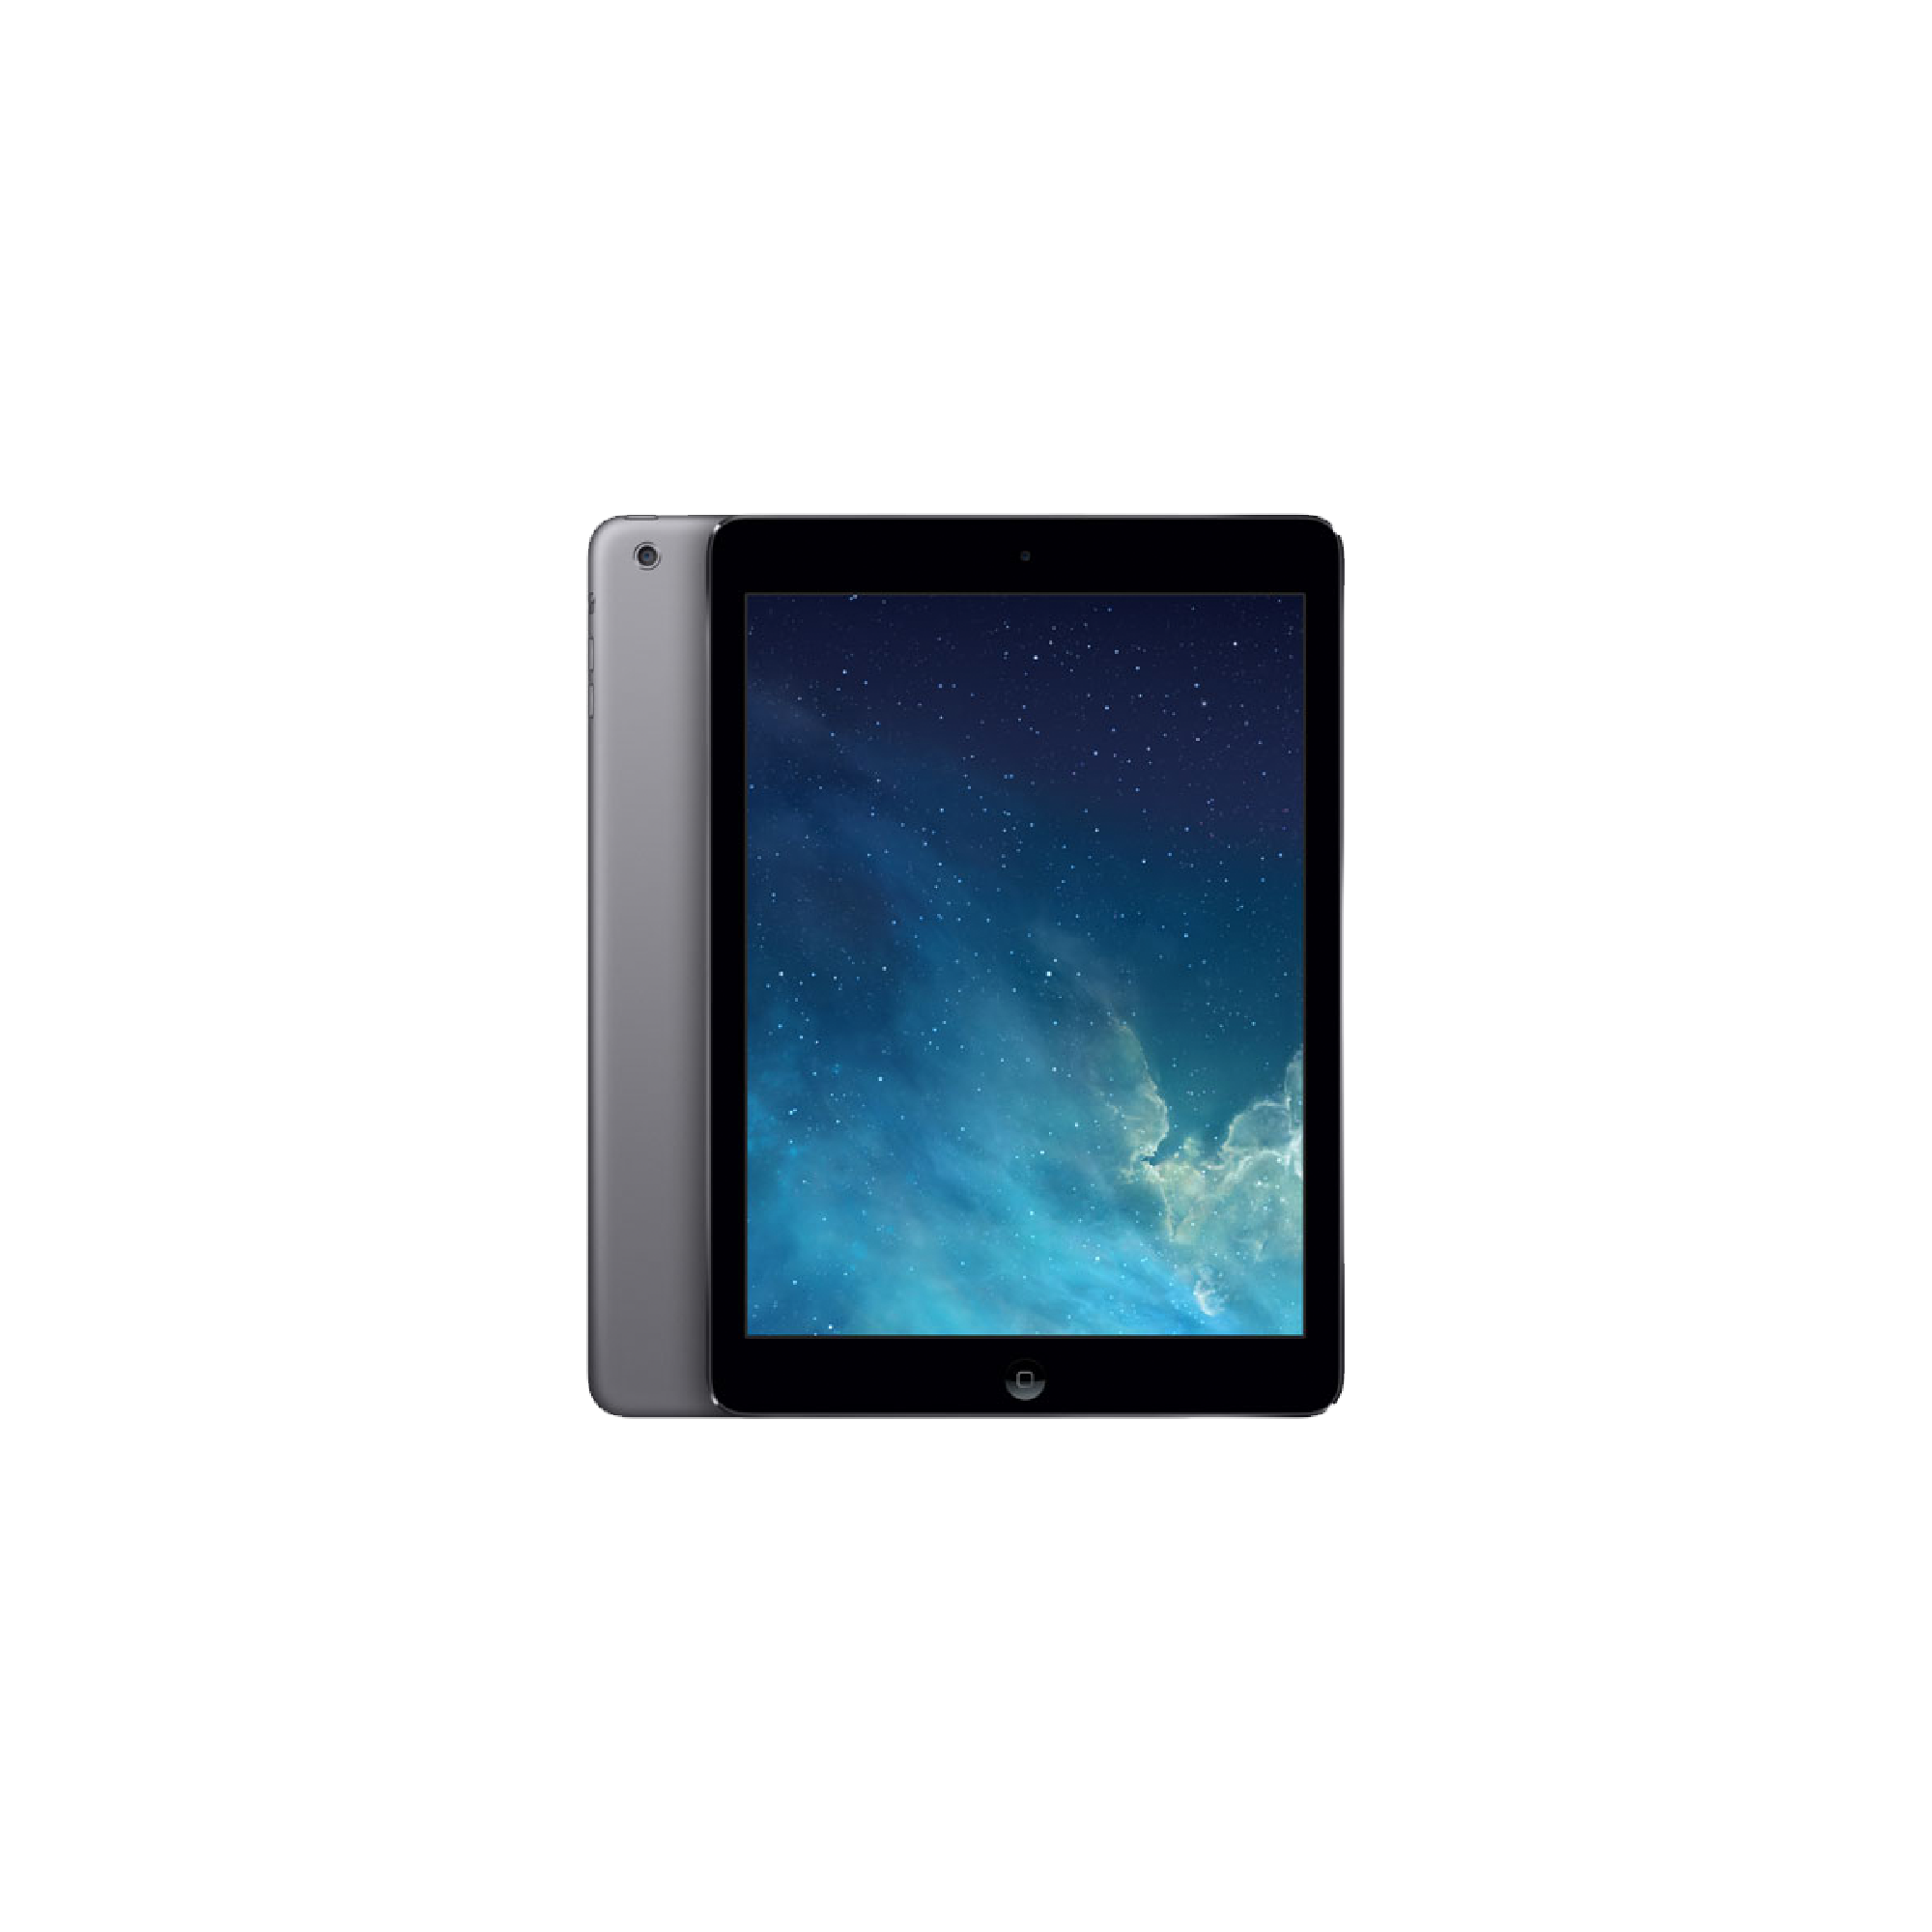 iPad Air 1 | $110 + tax